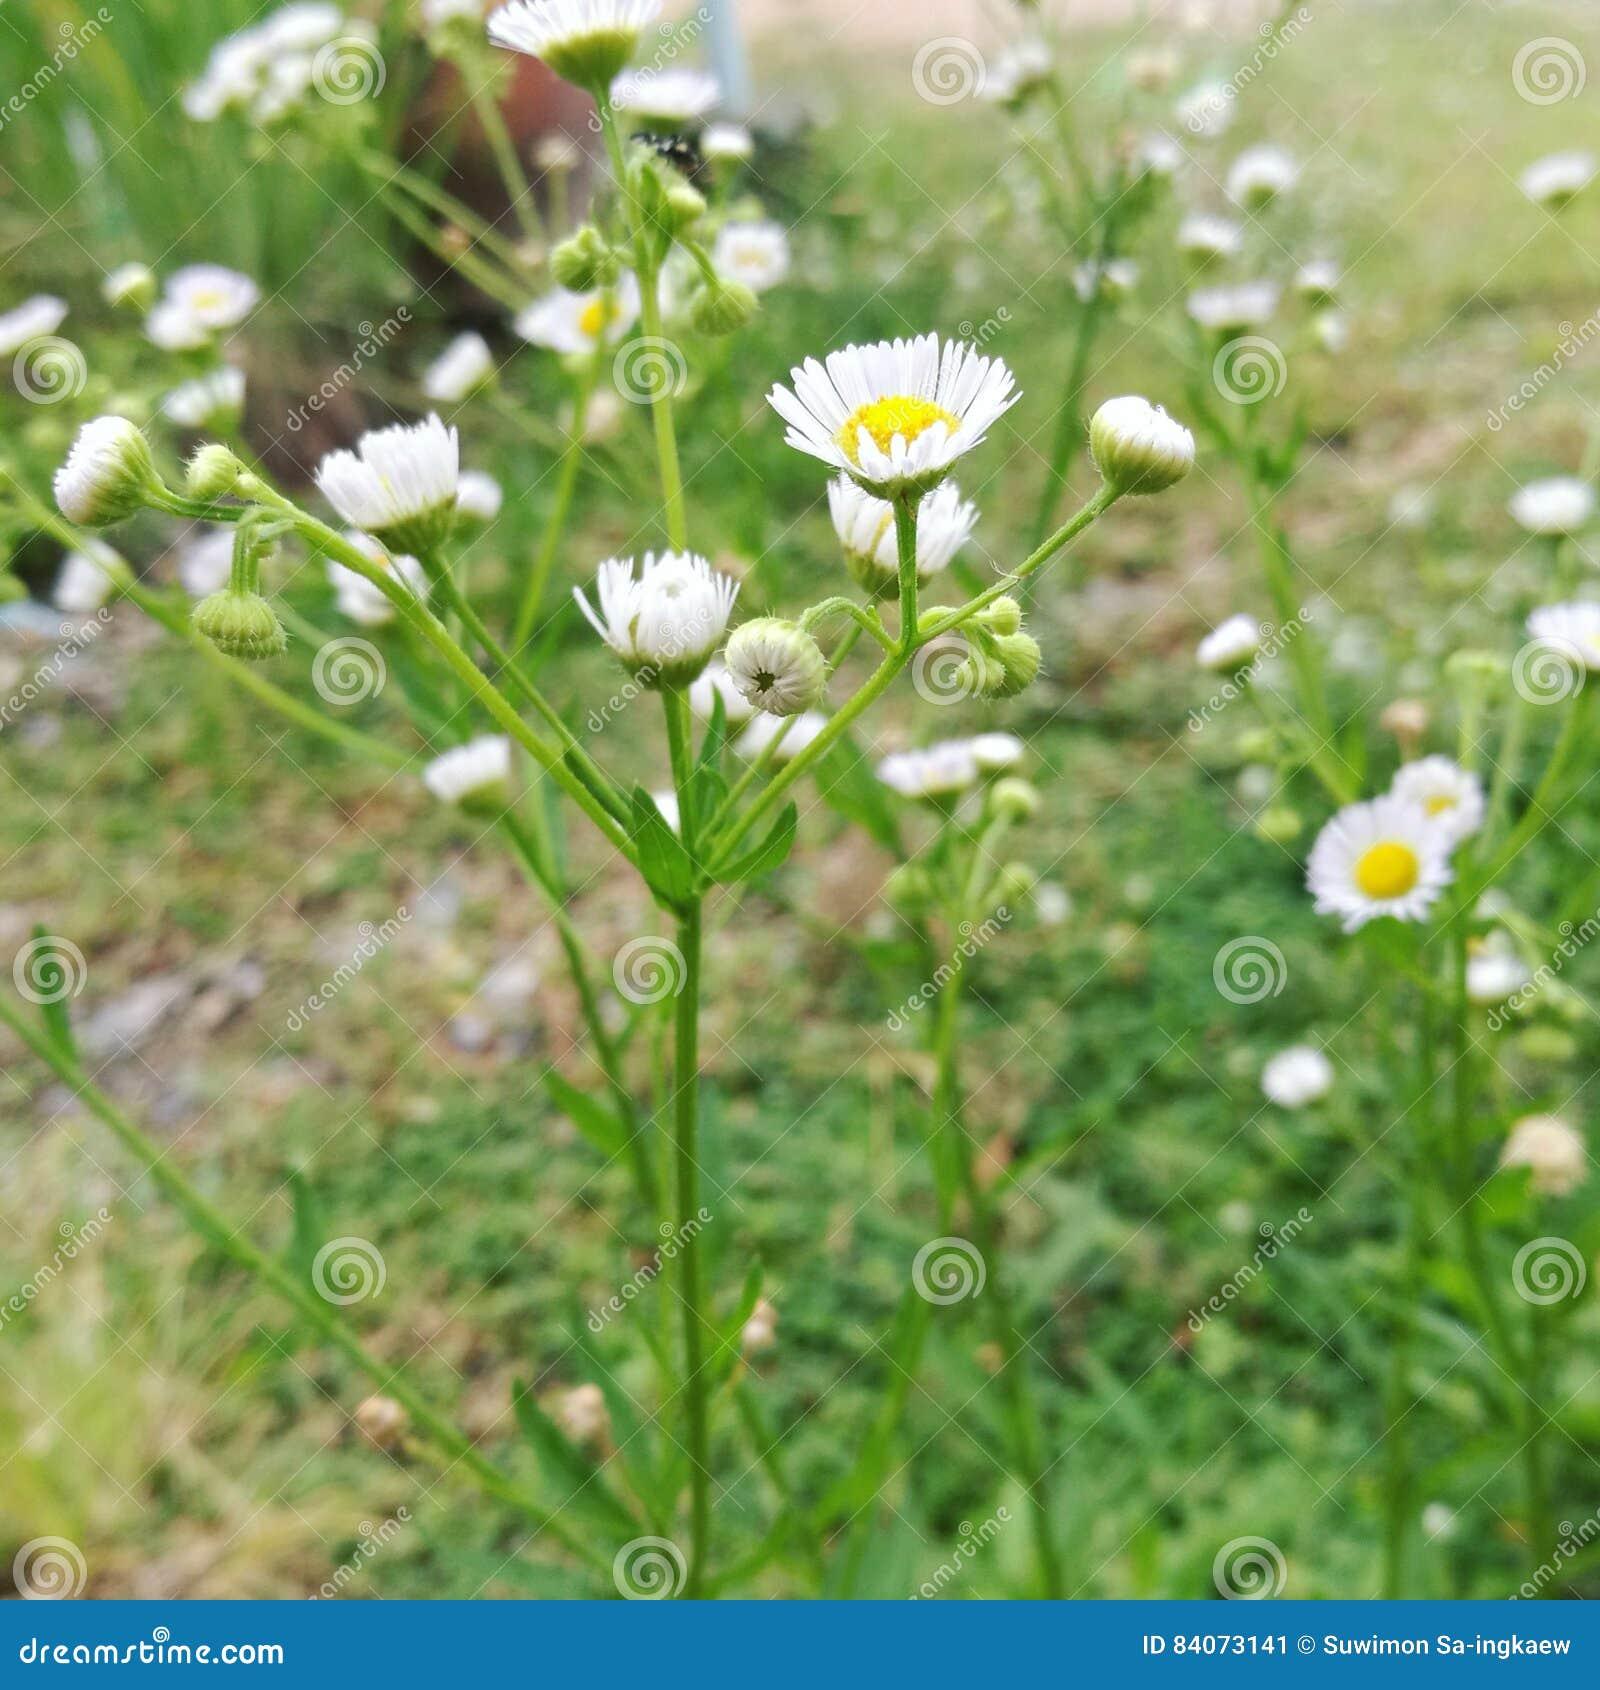 Flowering Grass Stock Image Image Of Flowering Whiteflowers 84073141